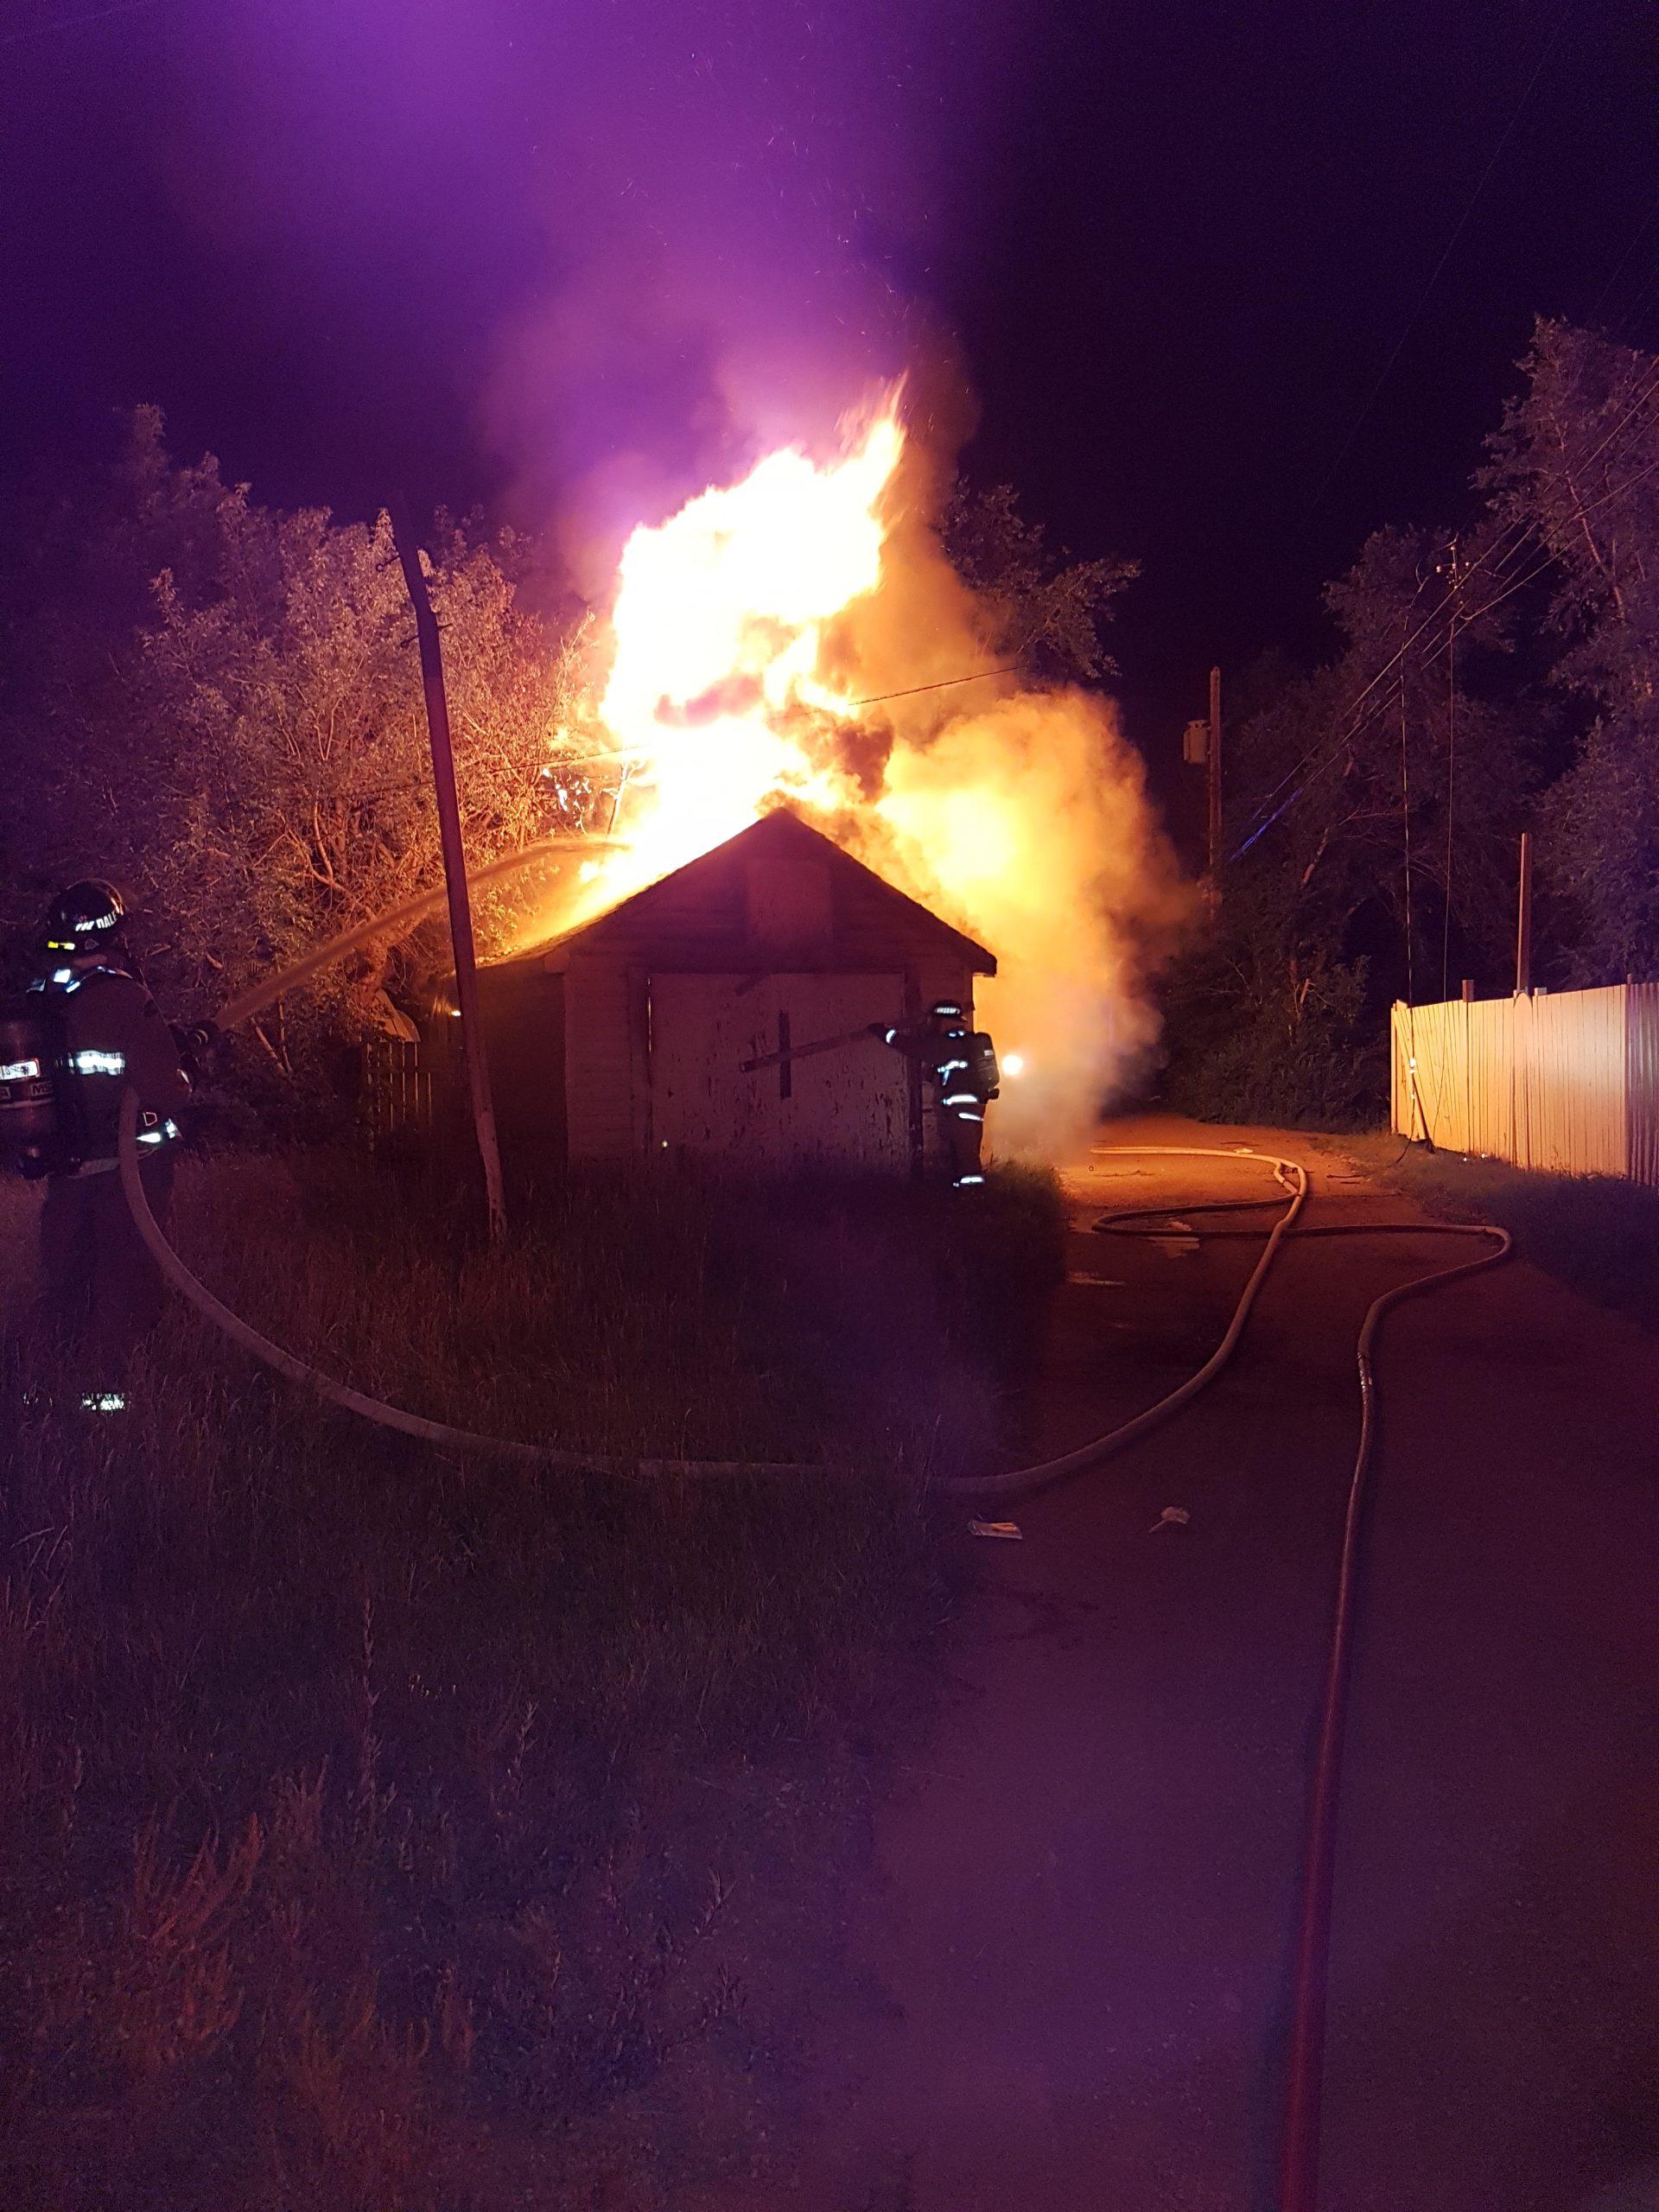 Garage Fire Takes Down Power Line